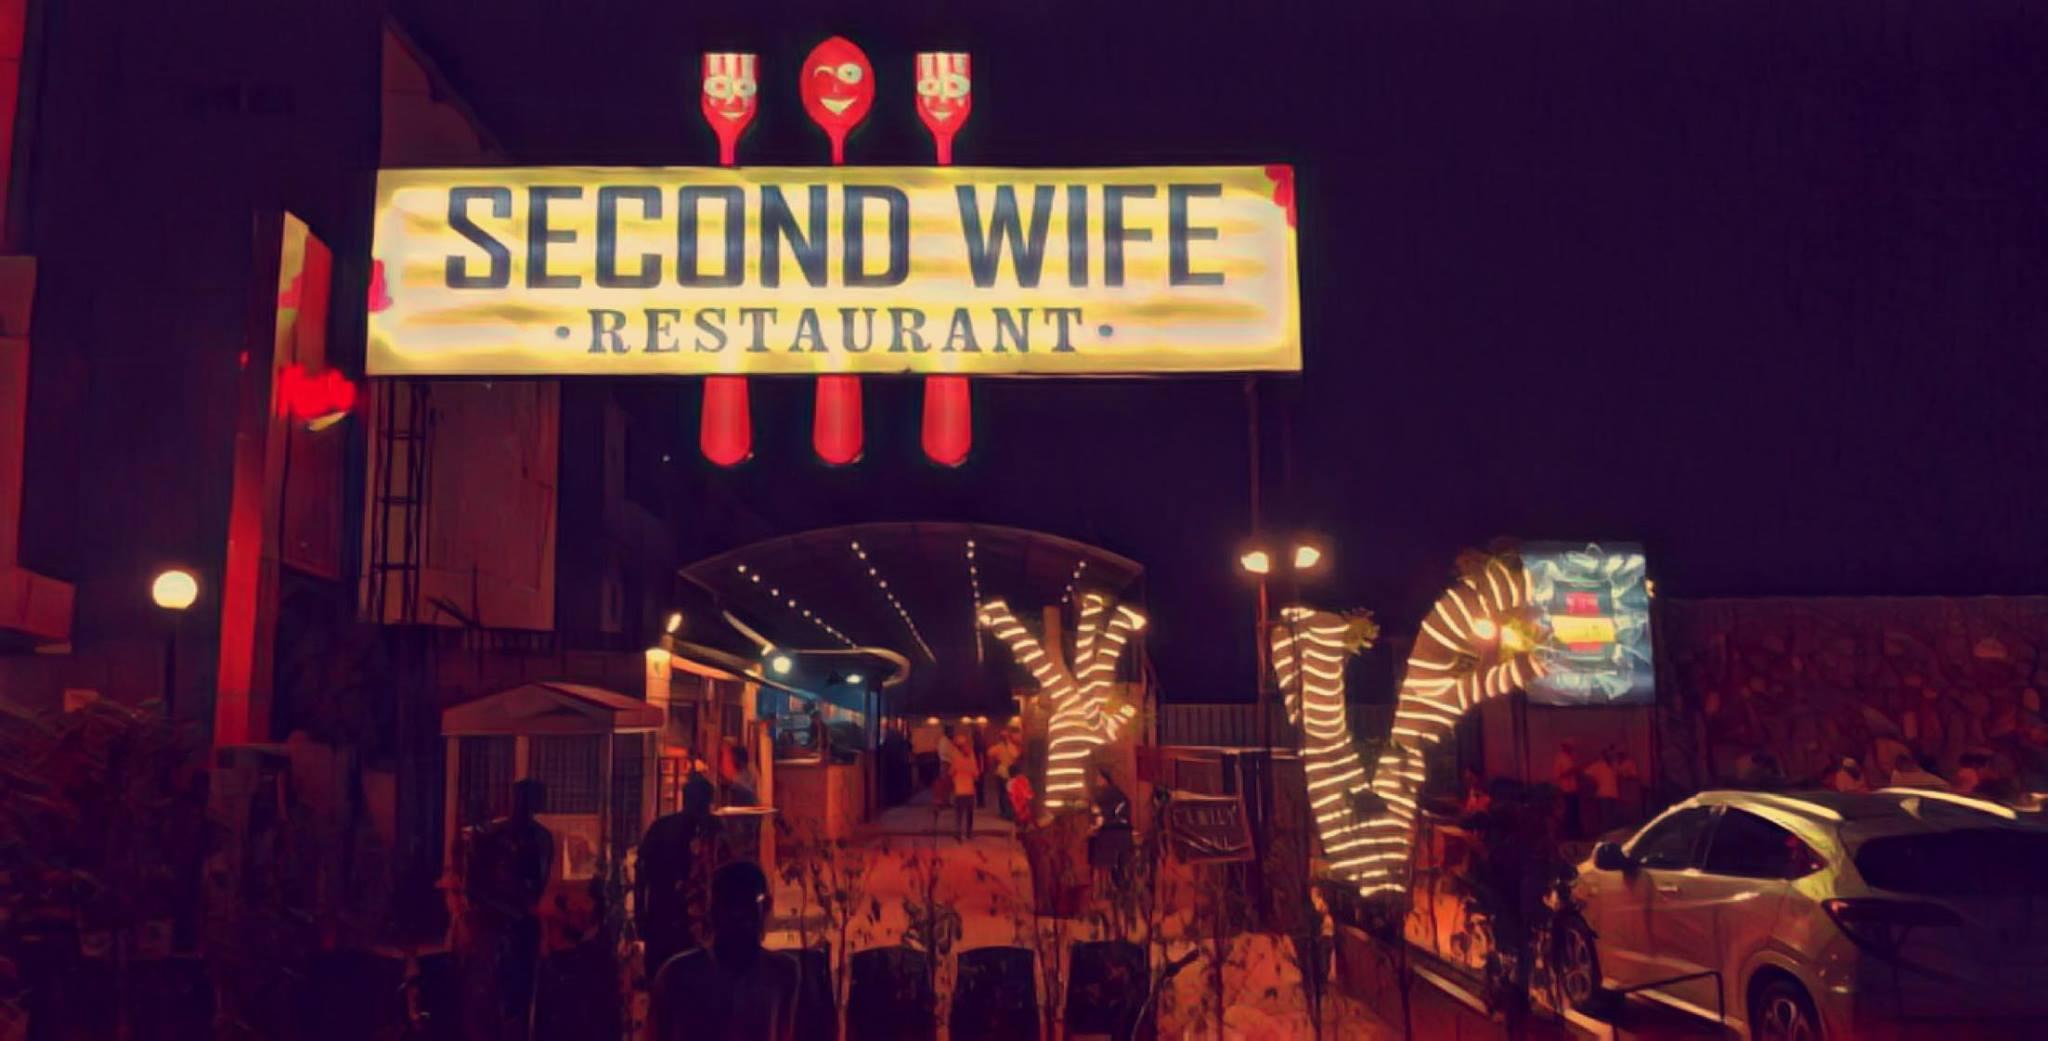 Second wife restaurant in karachi pakistan